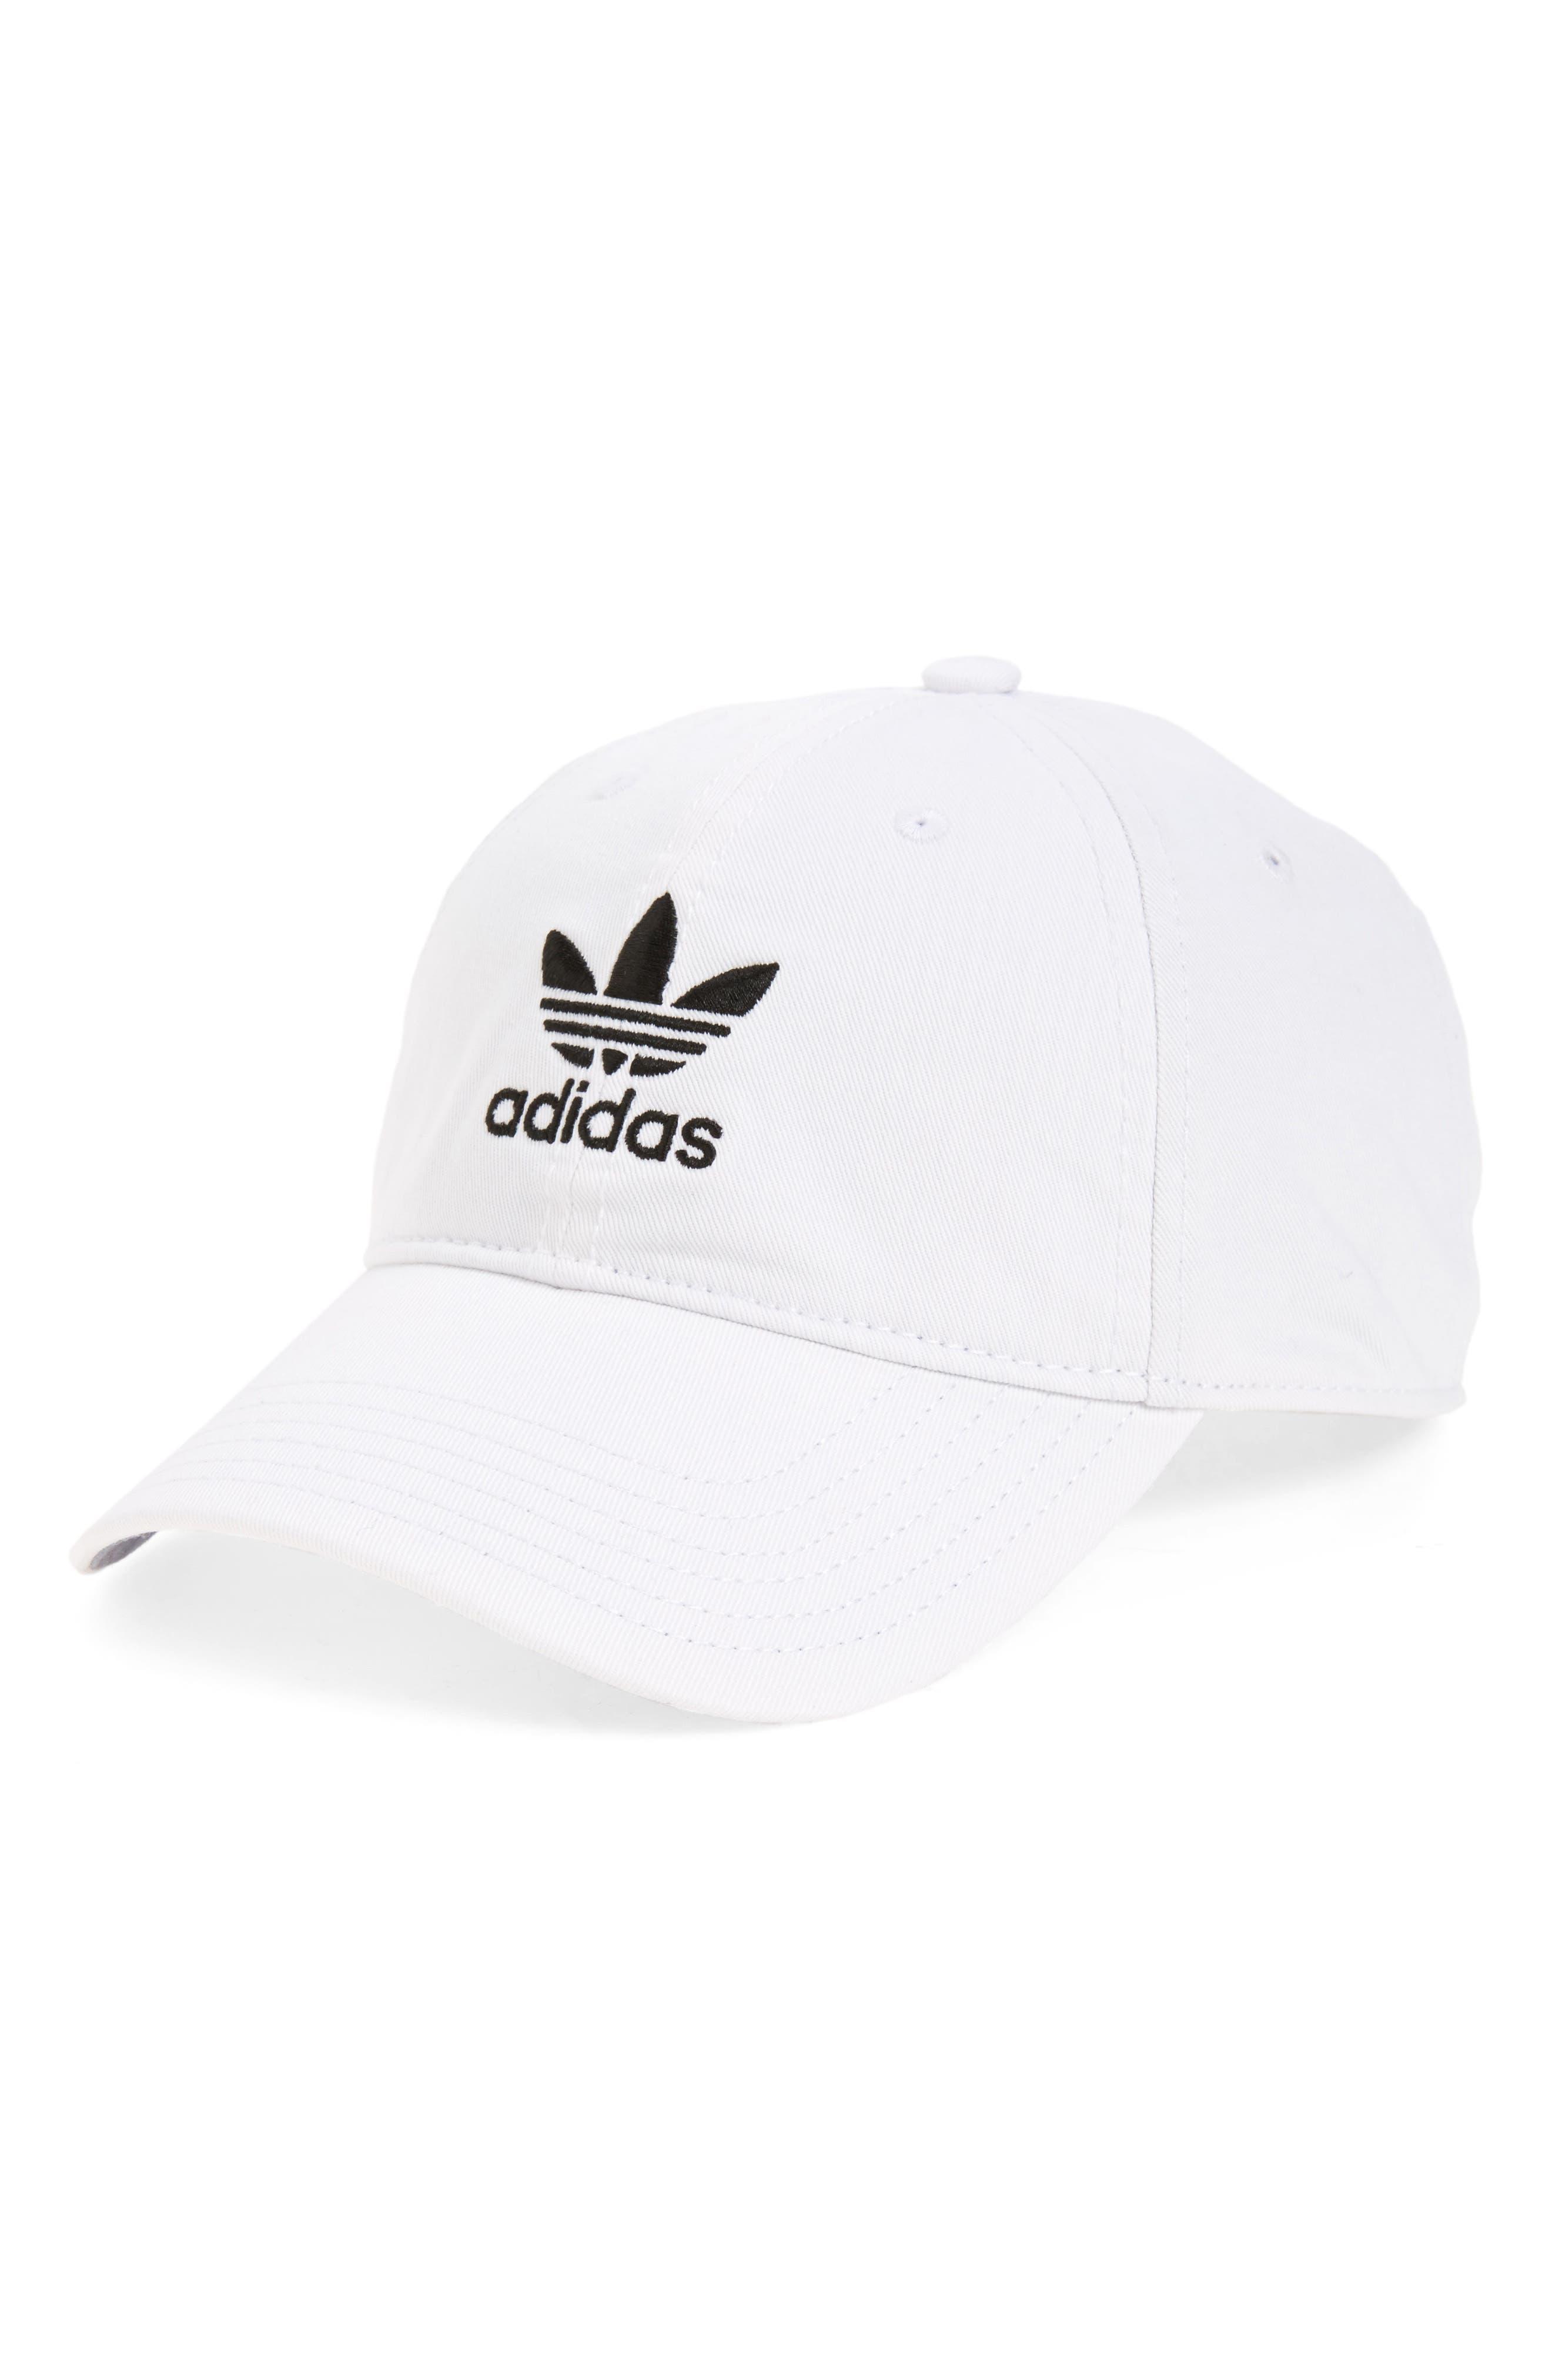 Men's Adidas Originals Hats, Hats for Men   Nordstrom